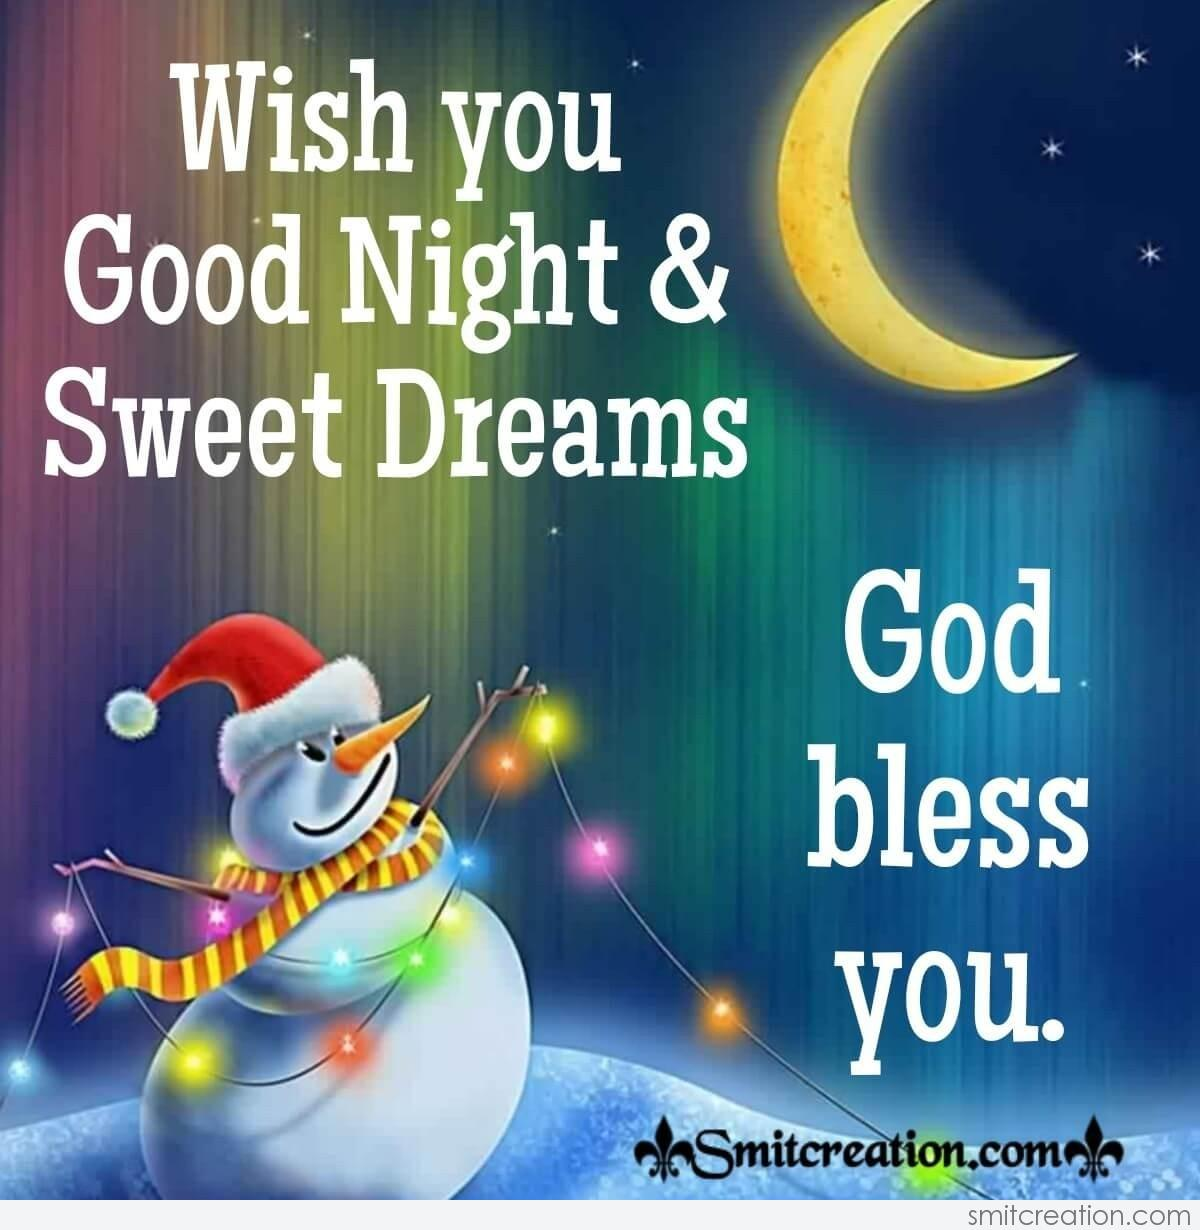 Wish You Good Night And Sweet Dreams - SmitCreation.com